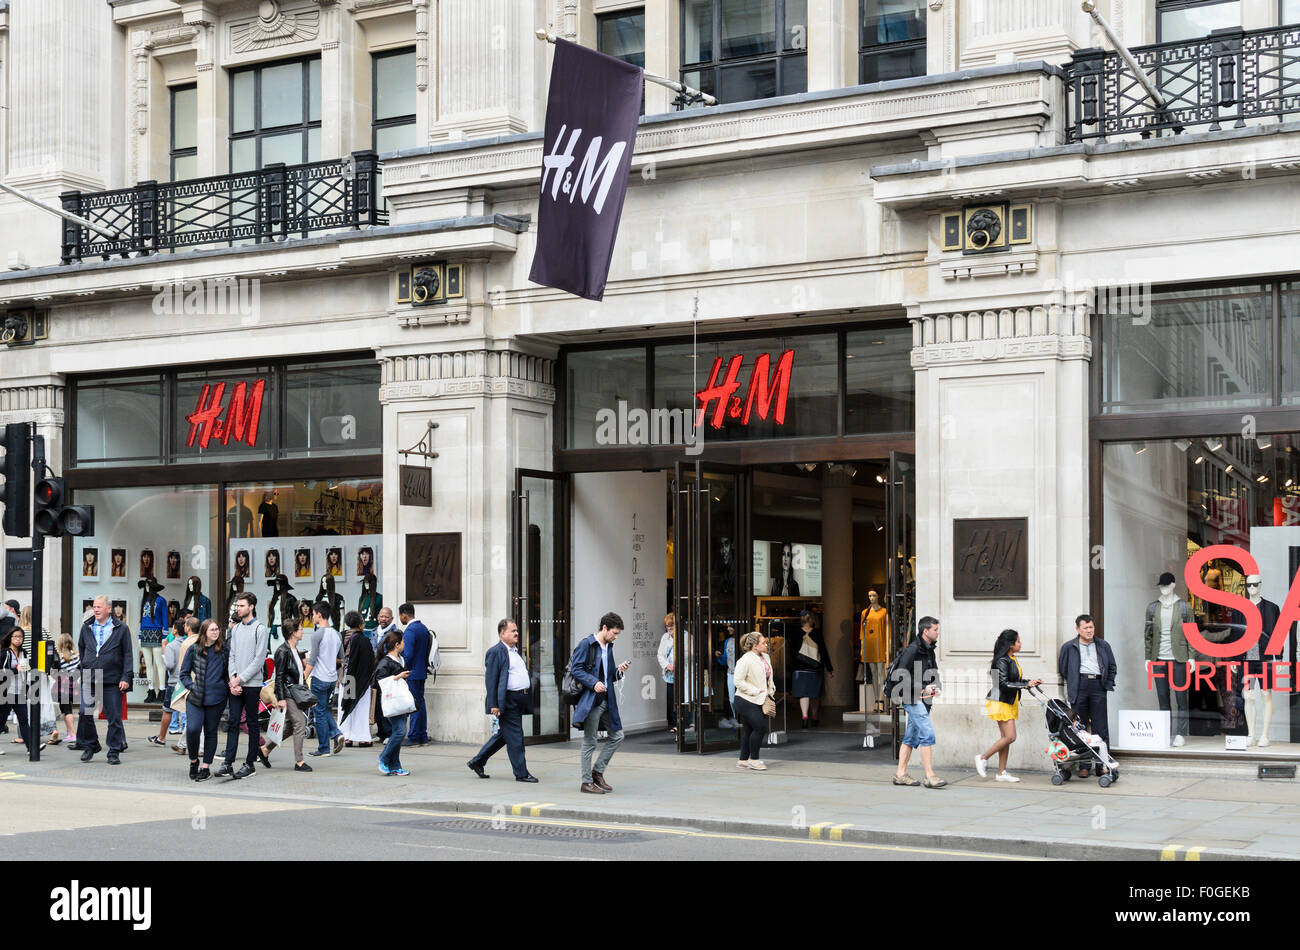 H&M retail store, Regent Street, London, England, UK. Stock Photo